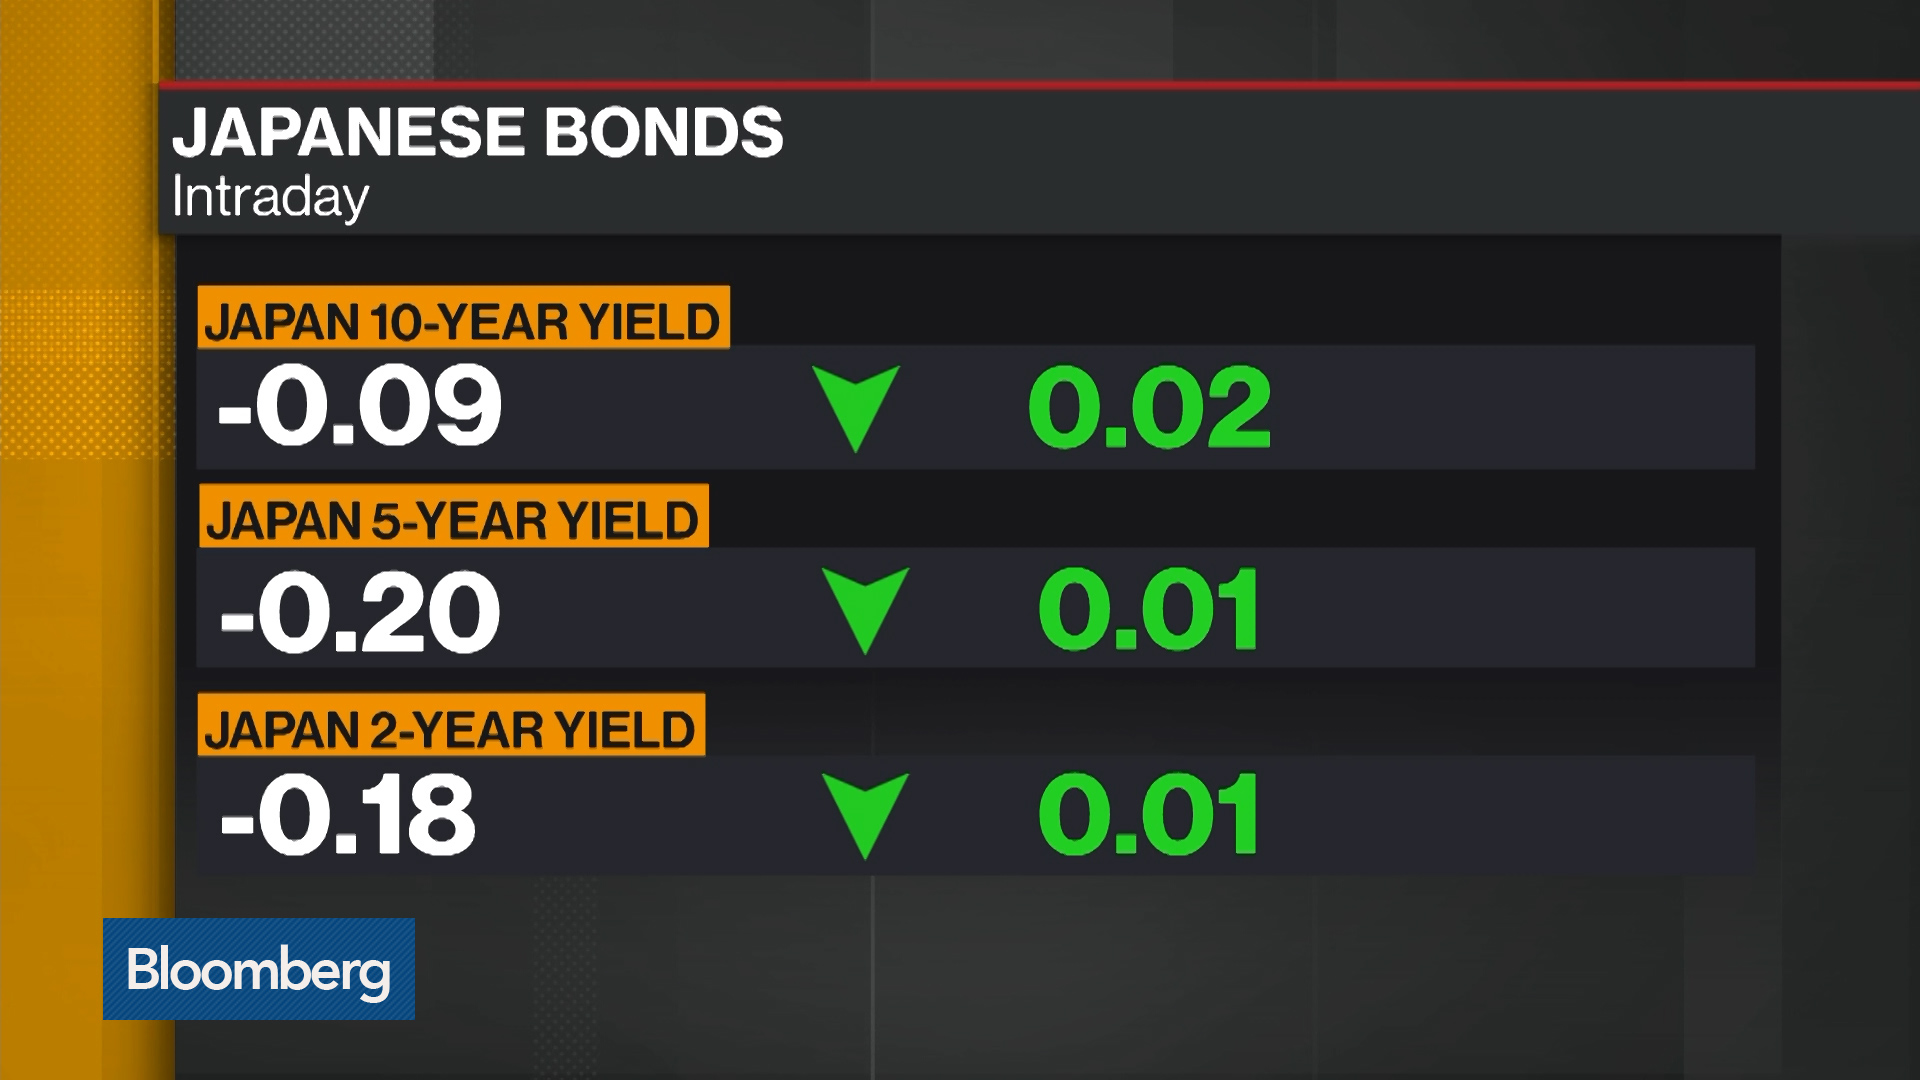 Japan's 10-Year Yield Seen Testing -0.1%